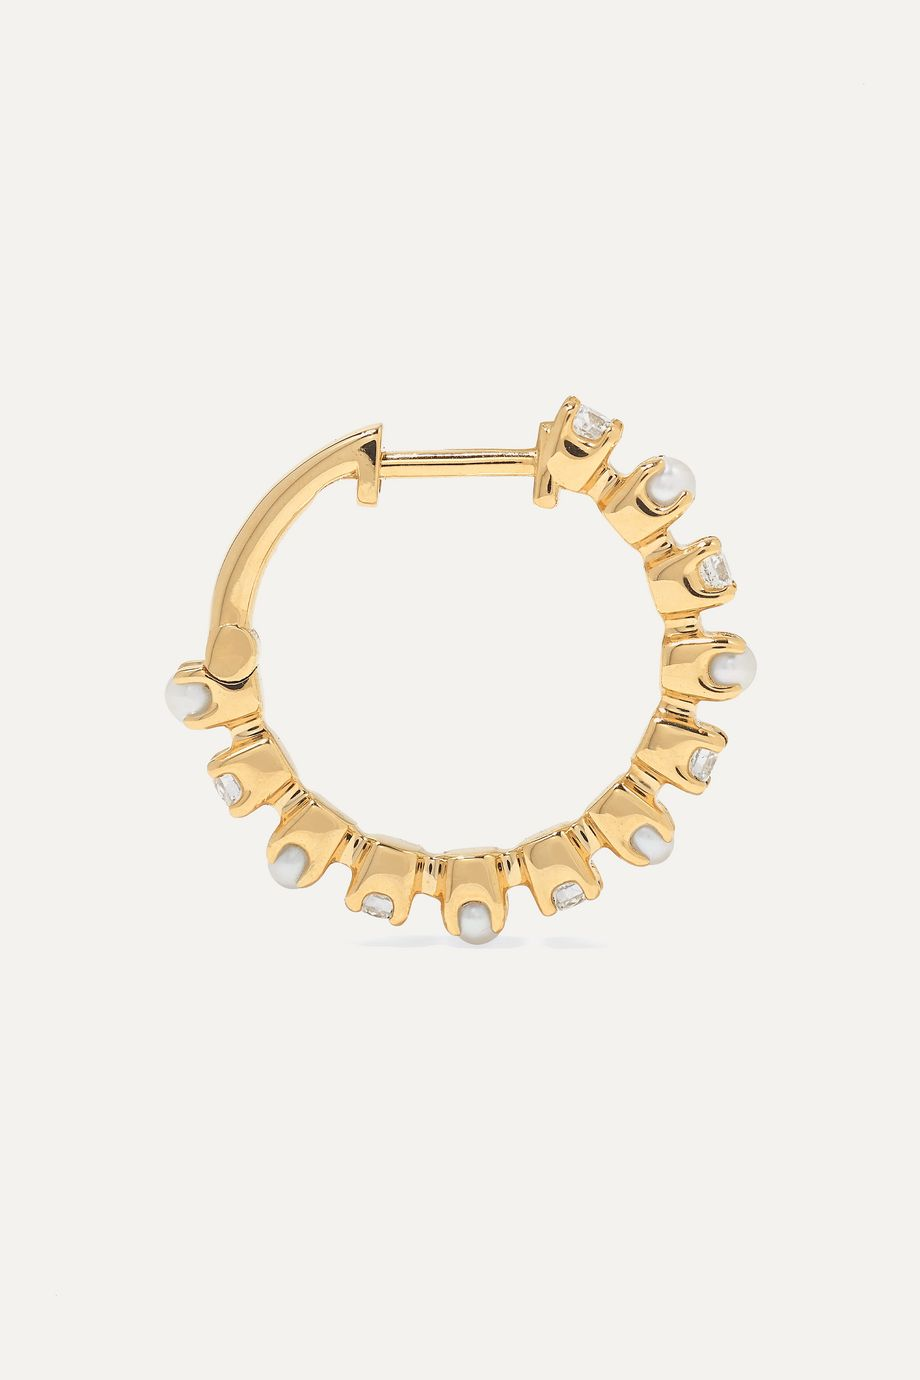 Marlo Laz Mini Full Circle 14-karat gold, diamond and pearl earrings